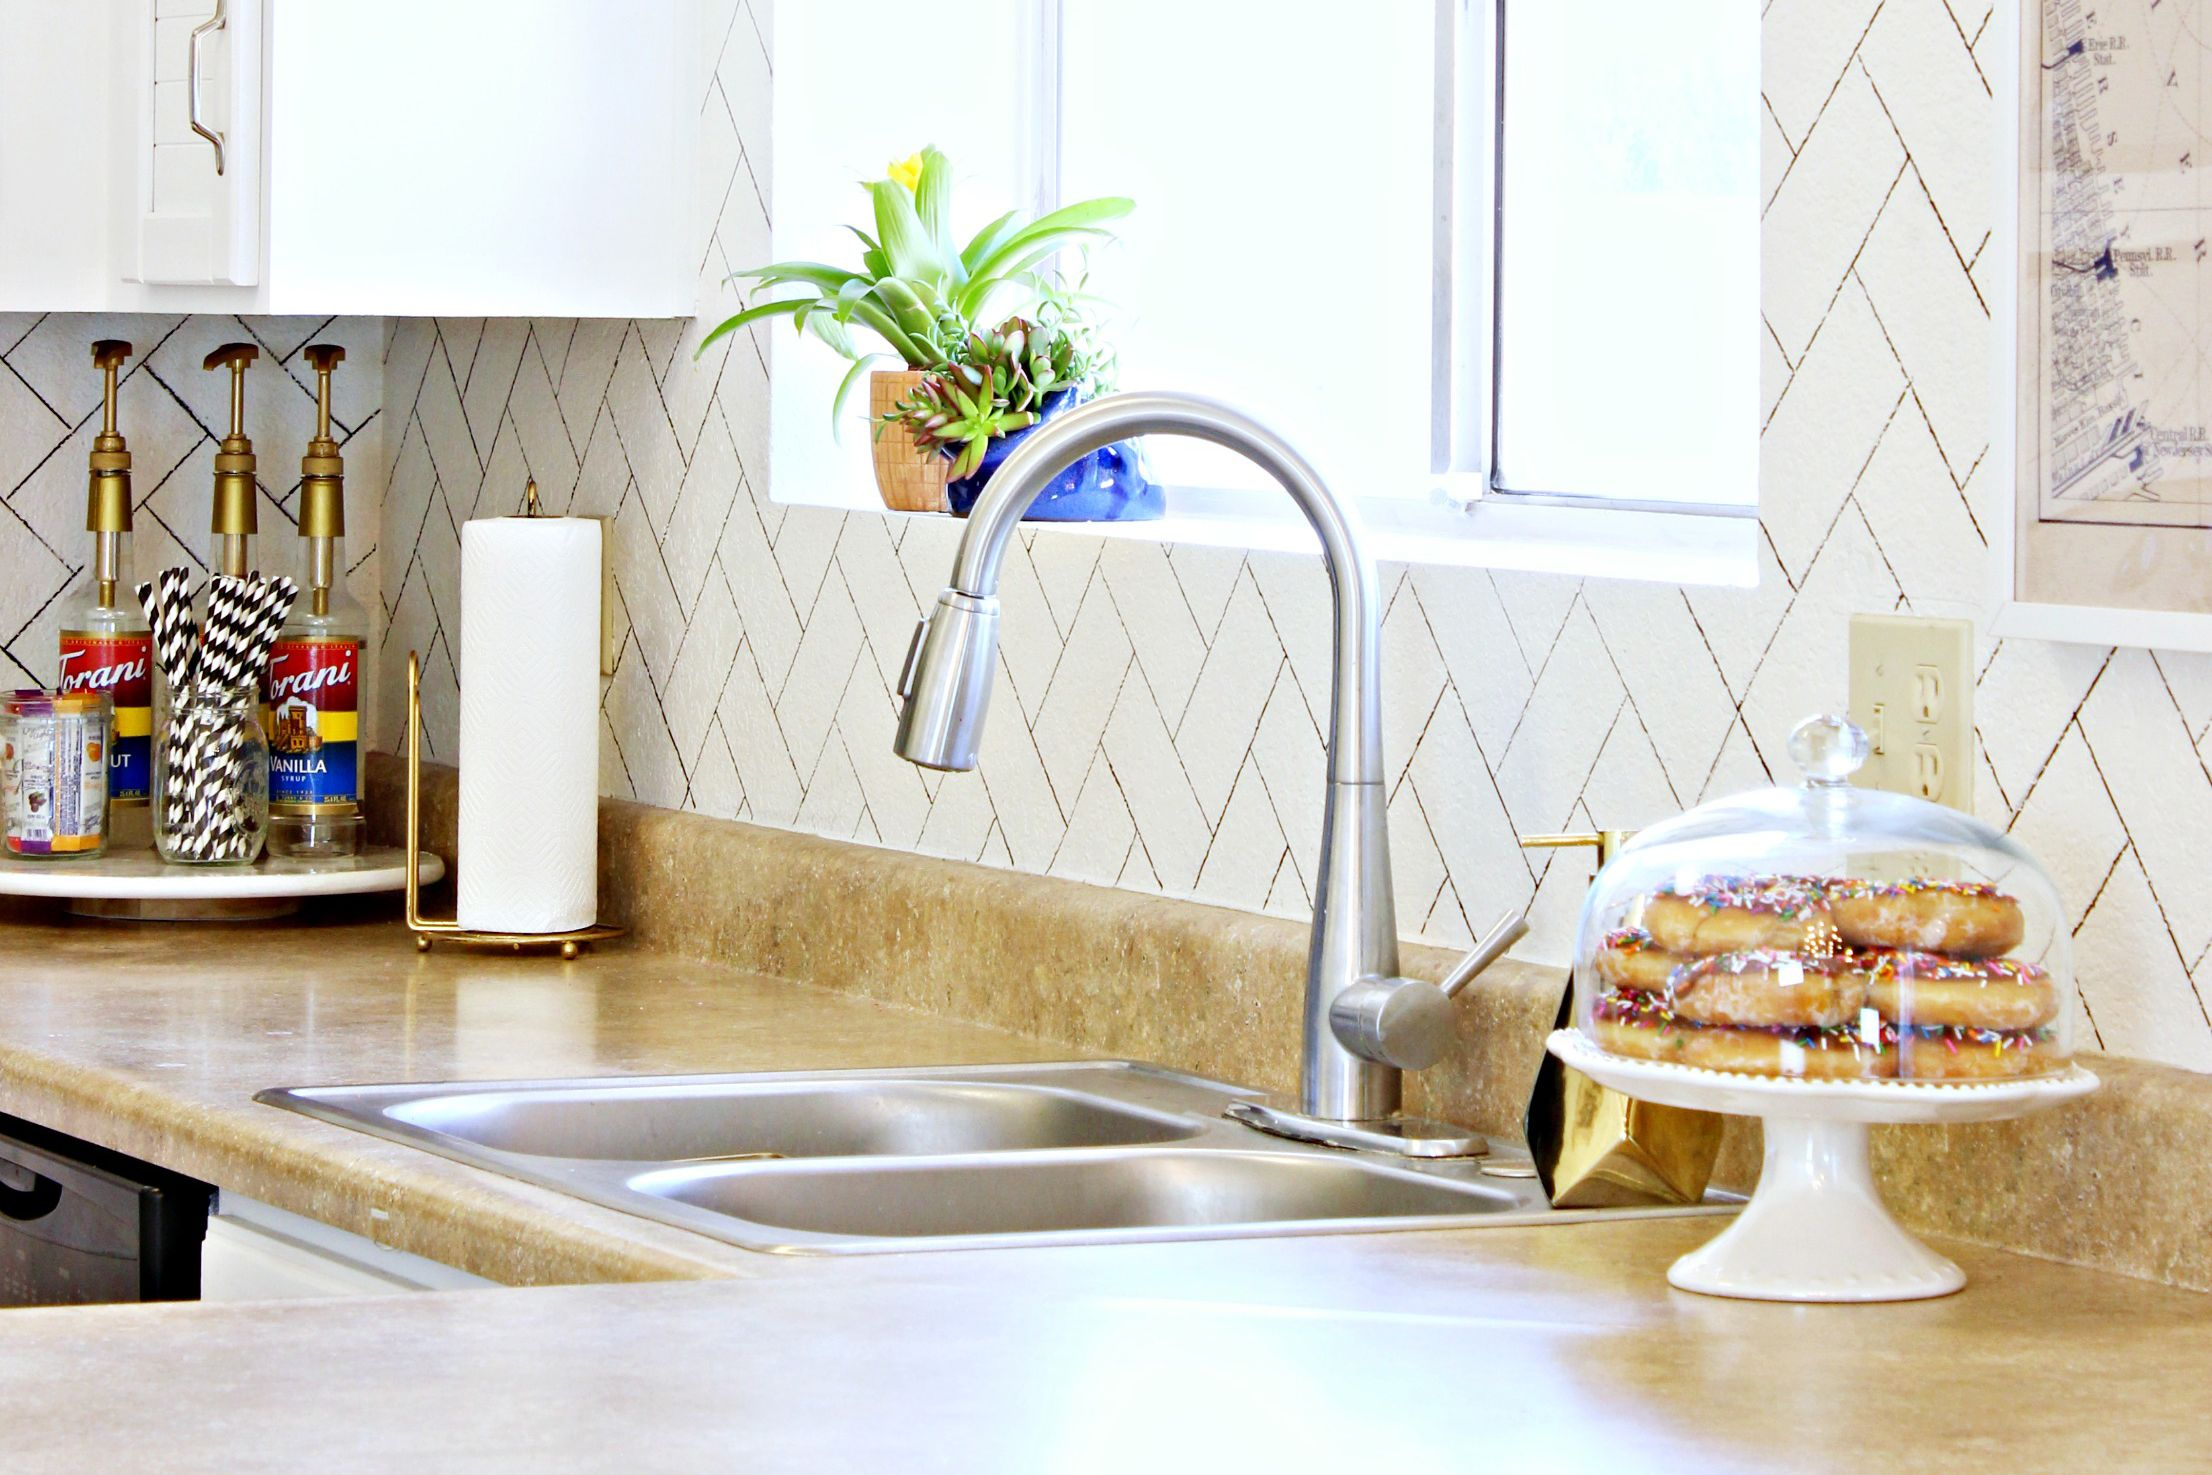 2 Sharpie Herringbone kitchen backsplash cc 5929dda45f9b